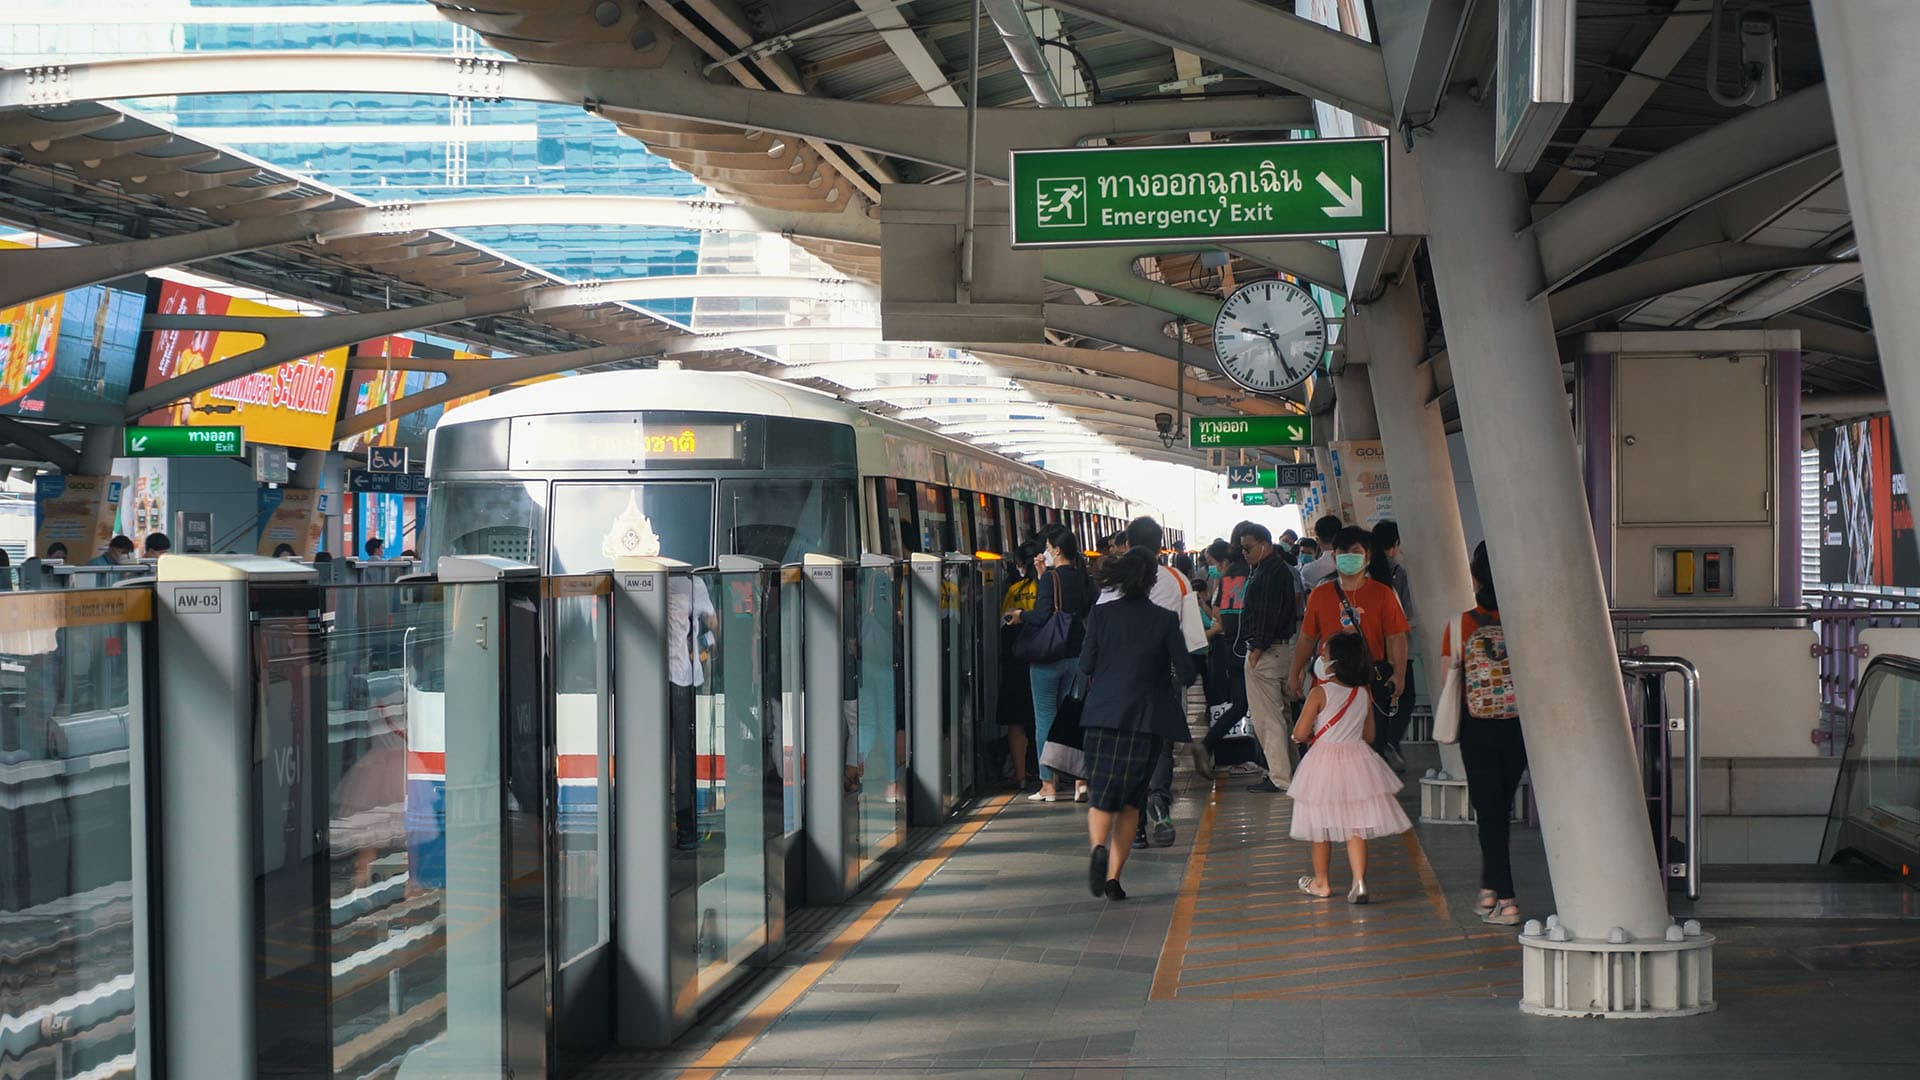 BTS Skytrain Station Sala Daeng in Bangkok